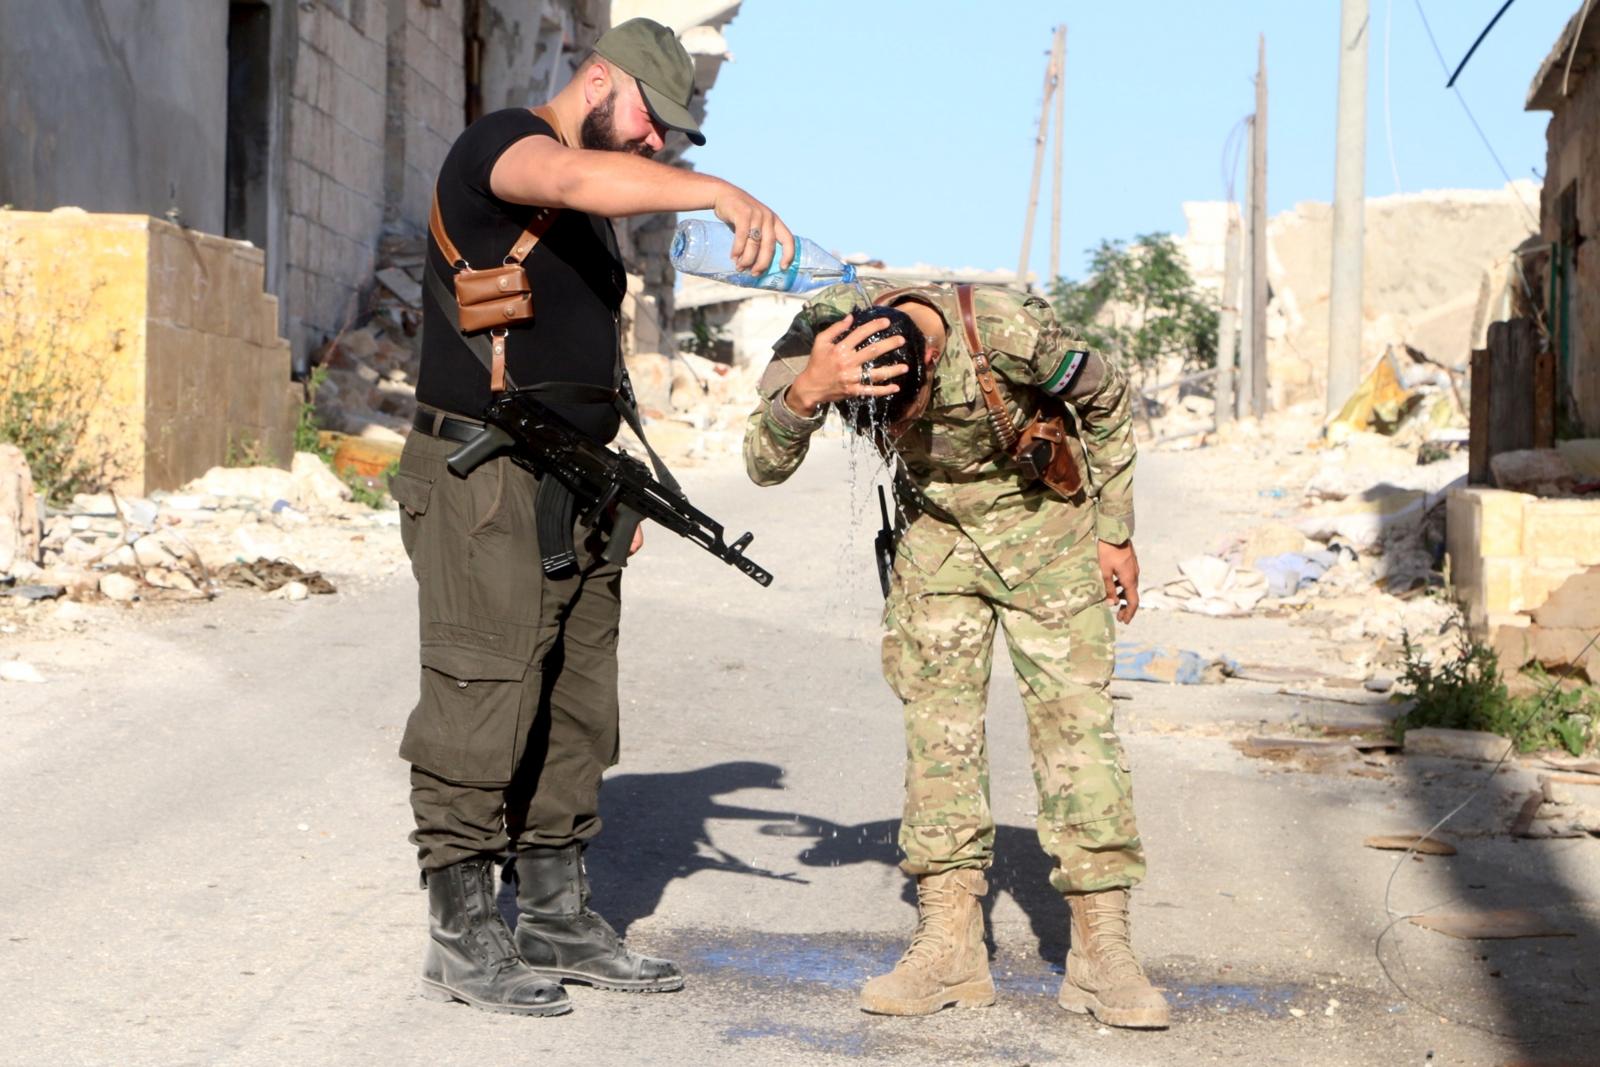 Handarat rebels Syria conflict 2016